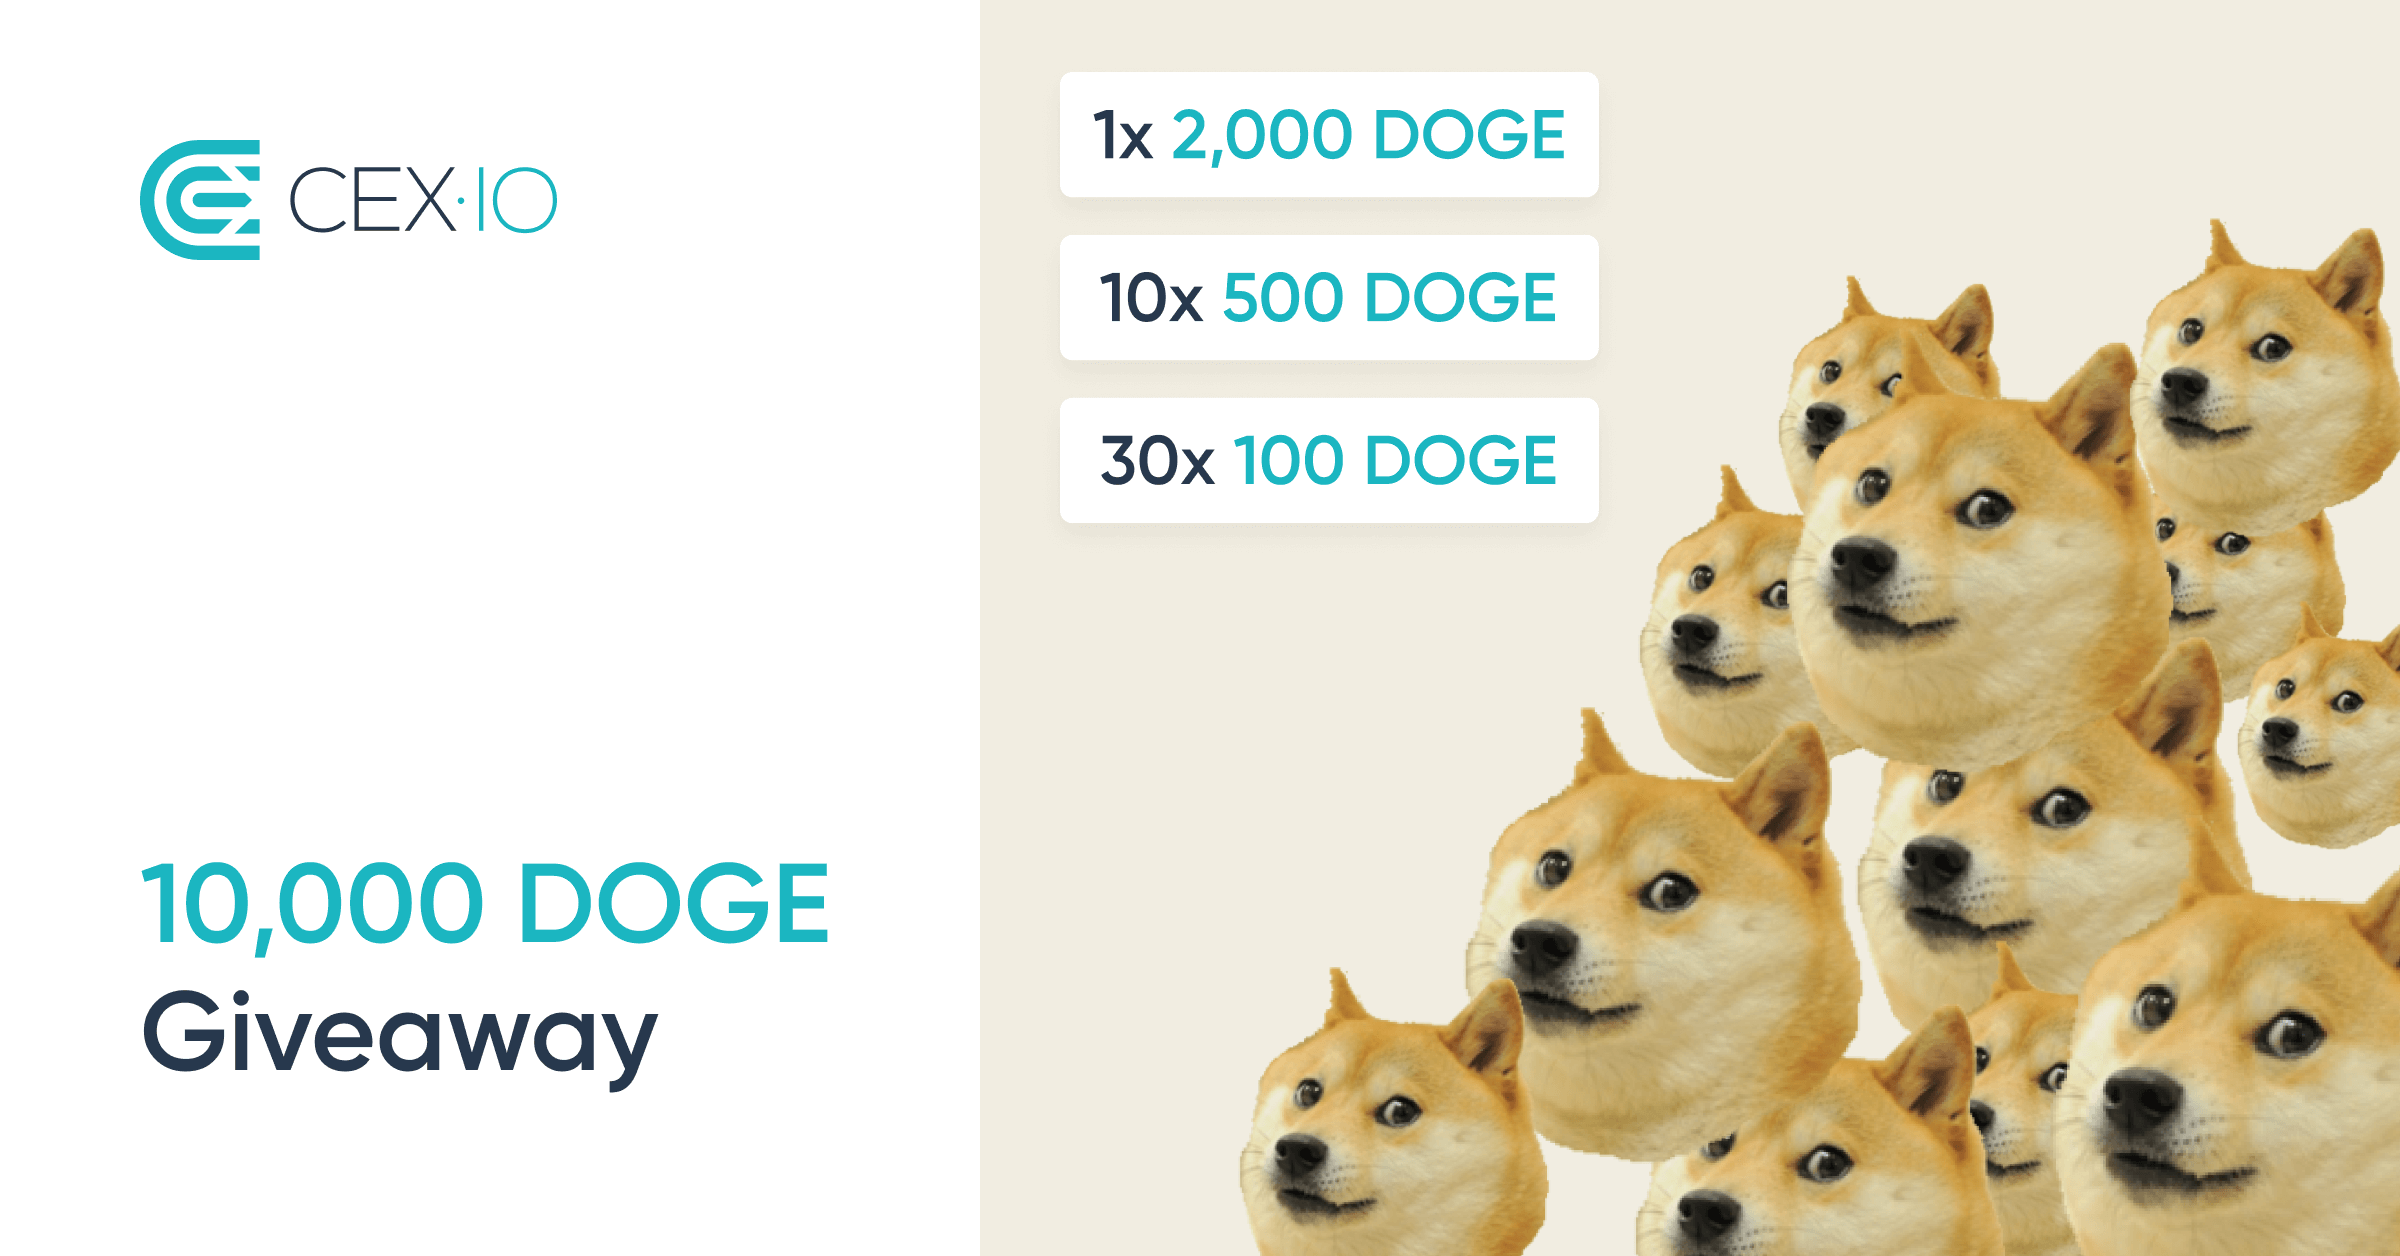 10,000 DOGE GIVEAWAY